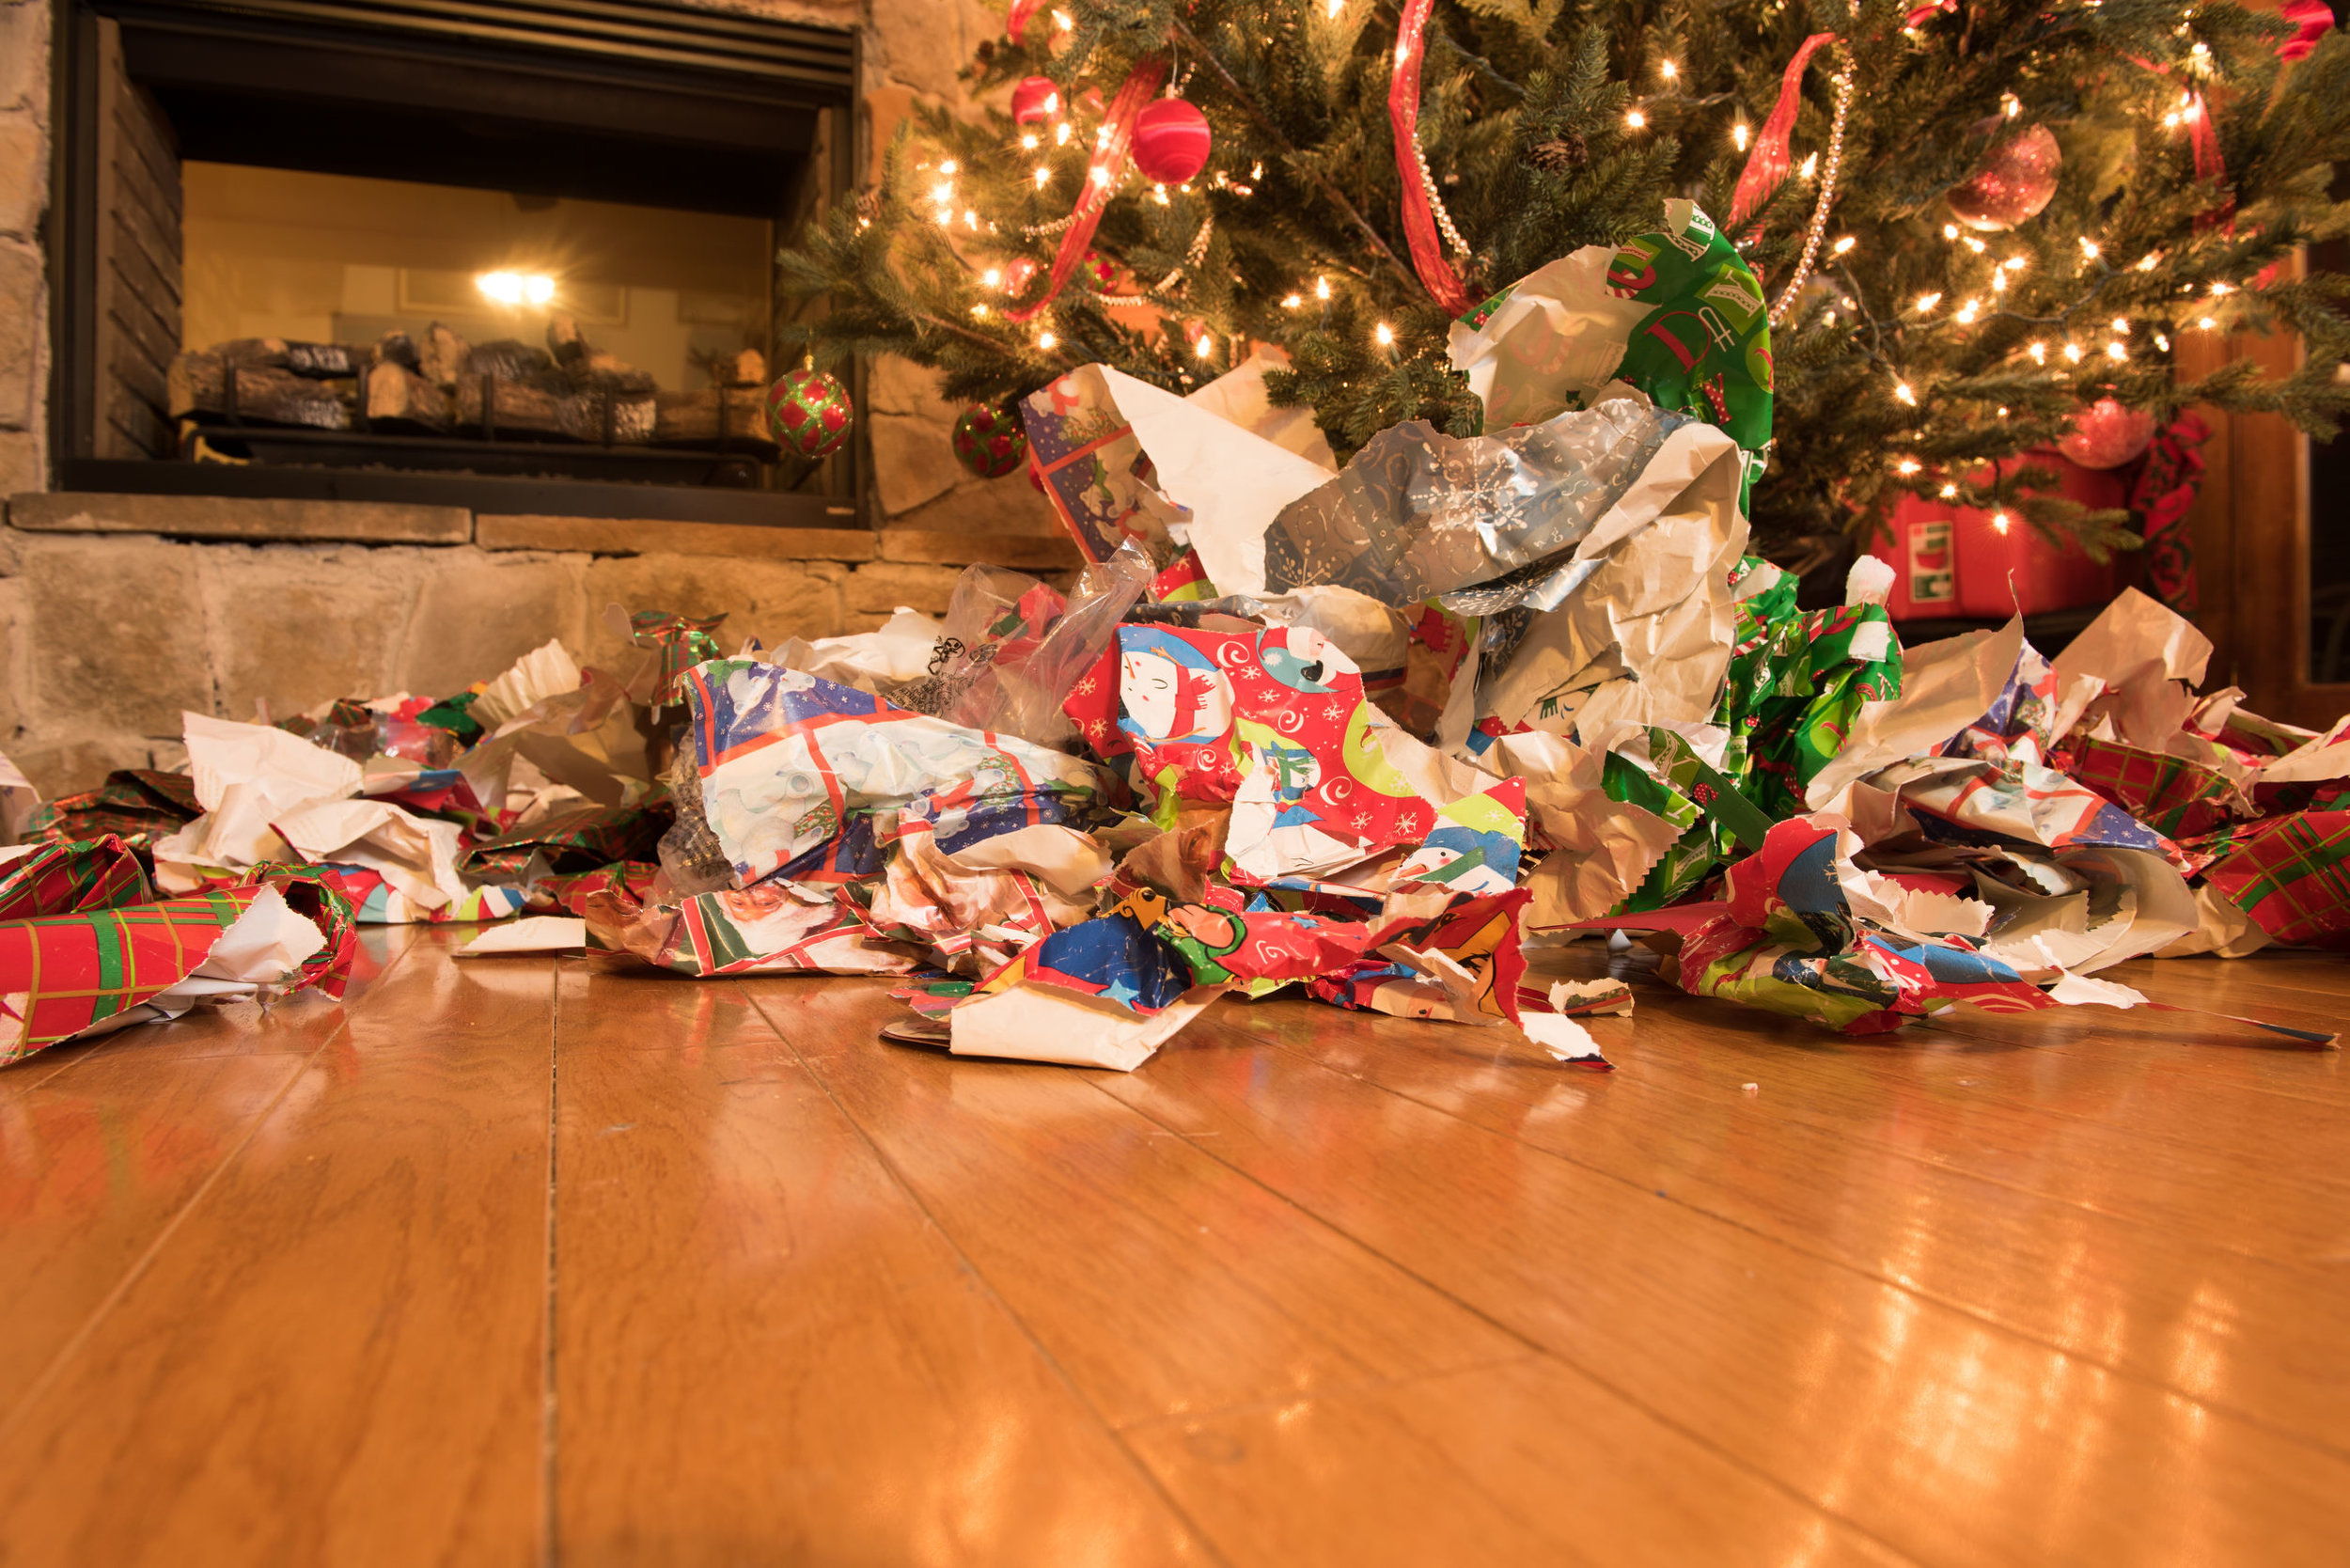 Mess after Christmas